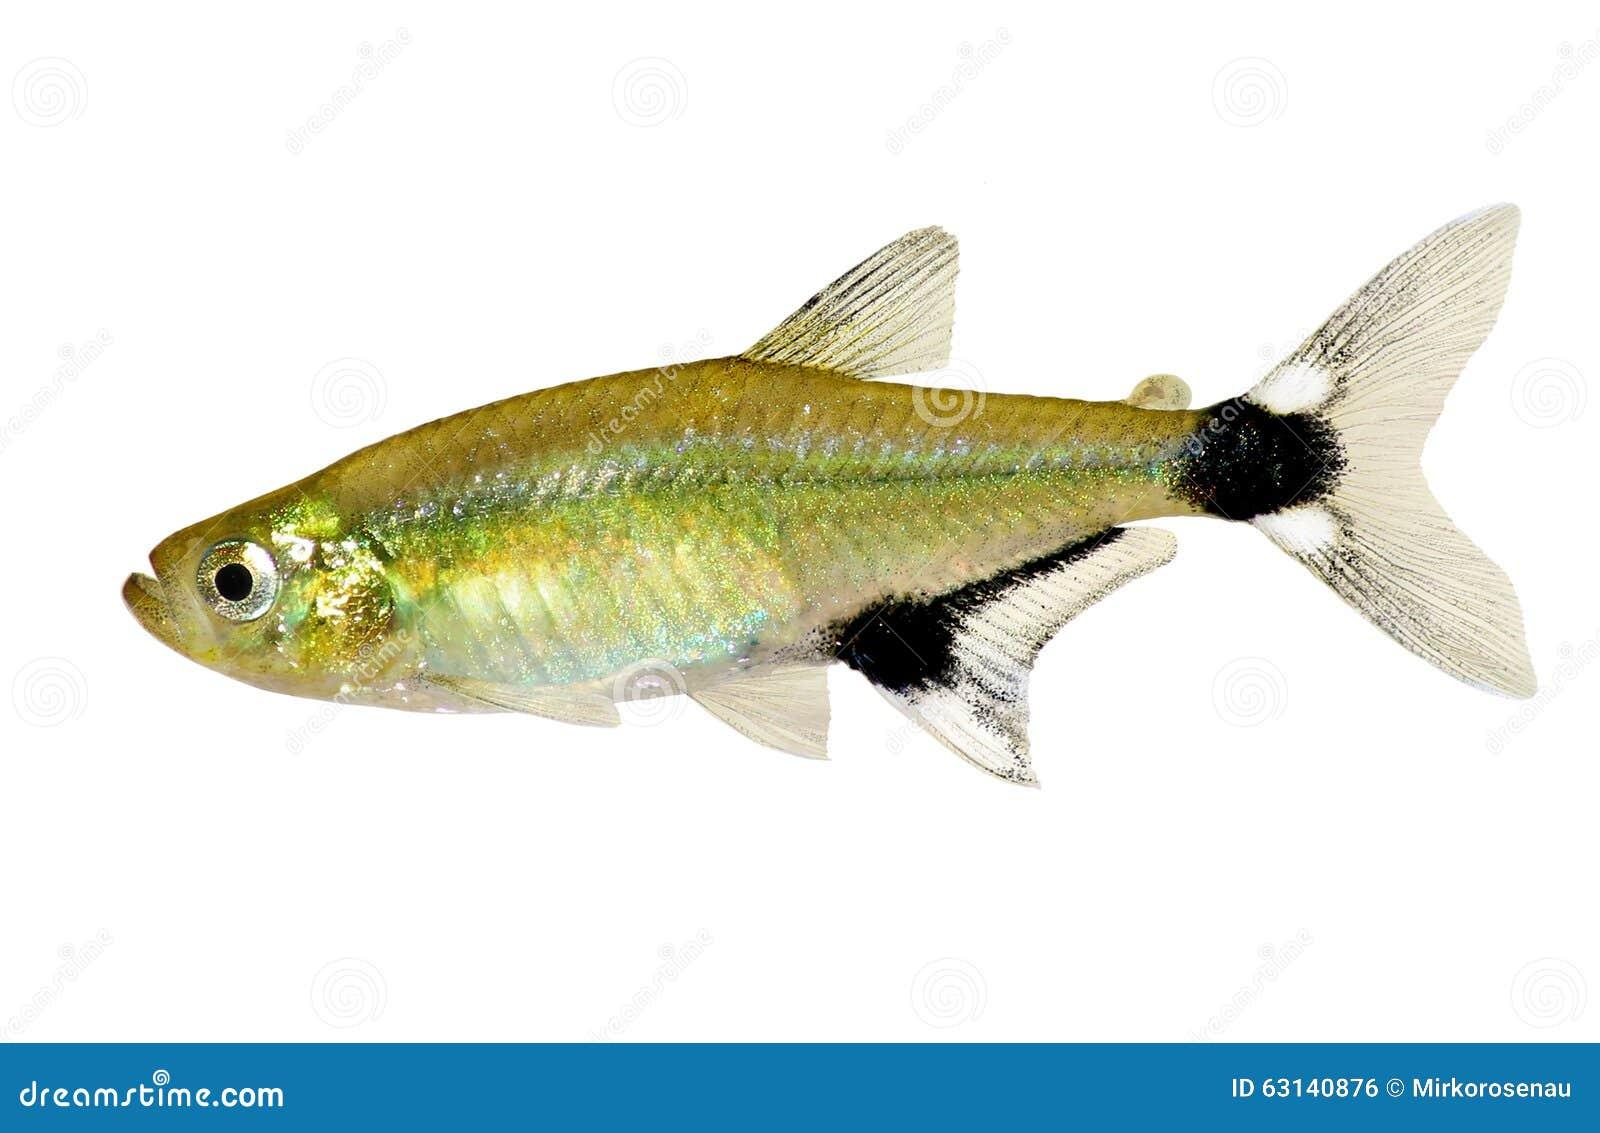 熊猫四黎明四Aphyocharax paraguayensis淡水水族馆鱼